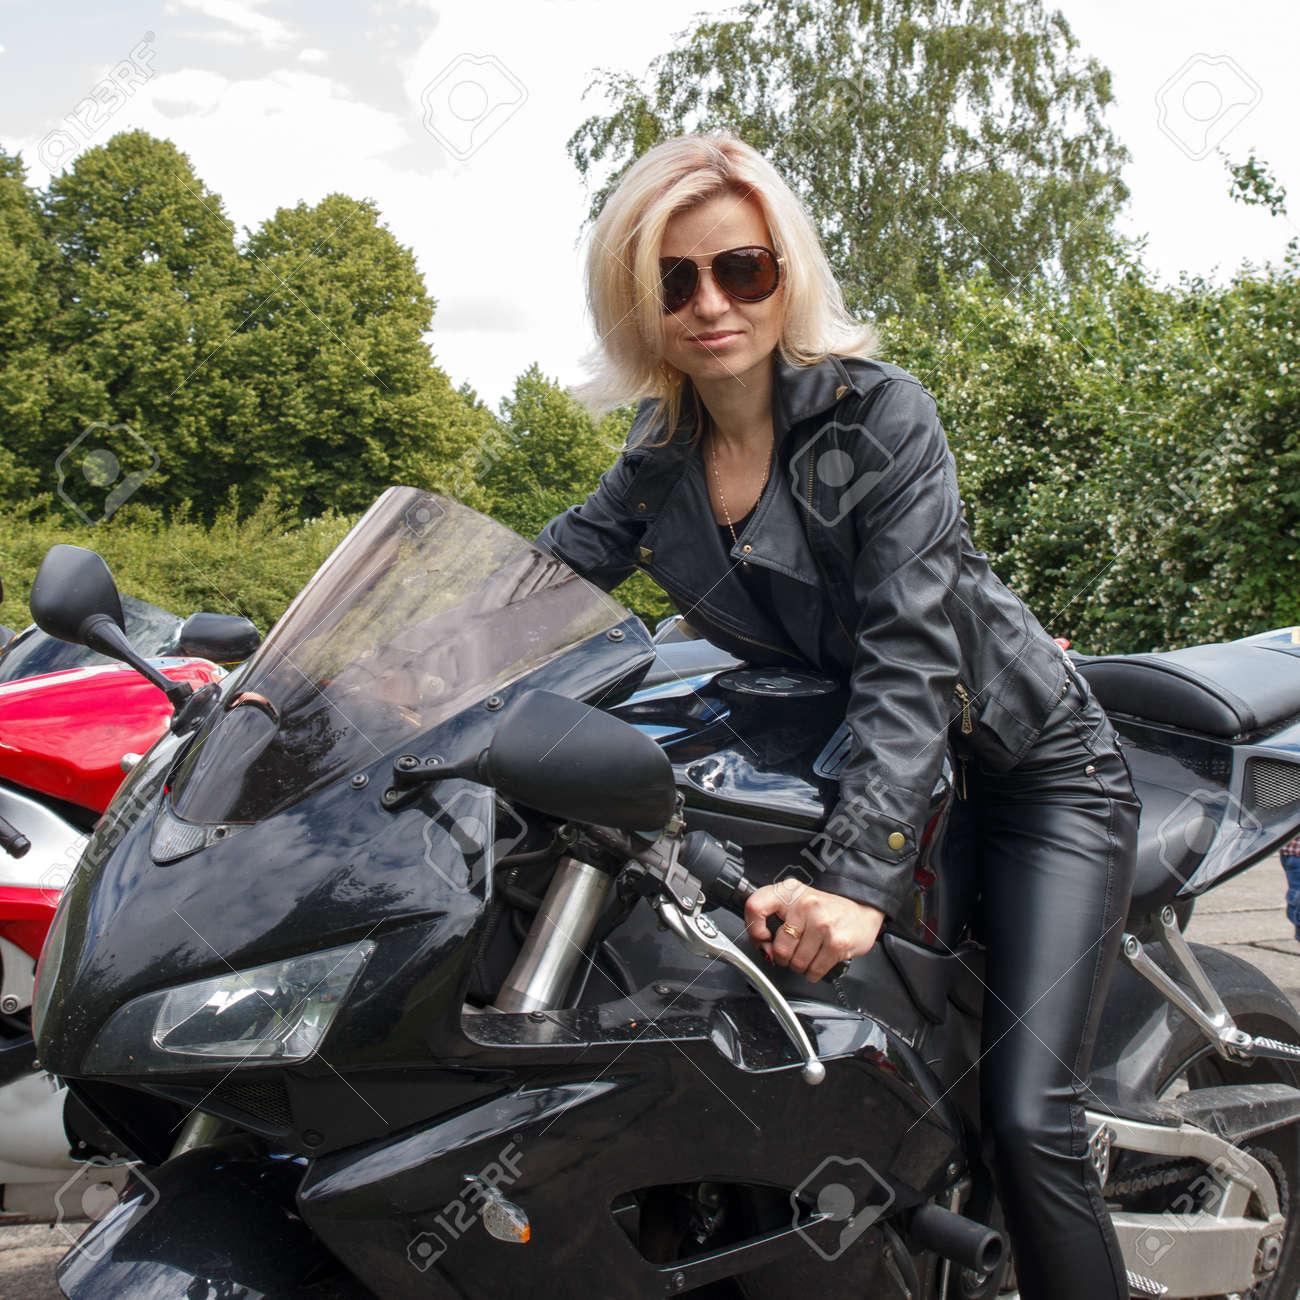 V-Twins - Biker Clothes - Dren Female version Special Price